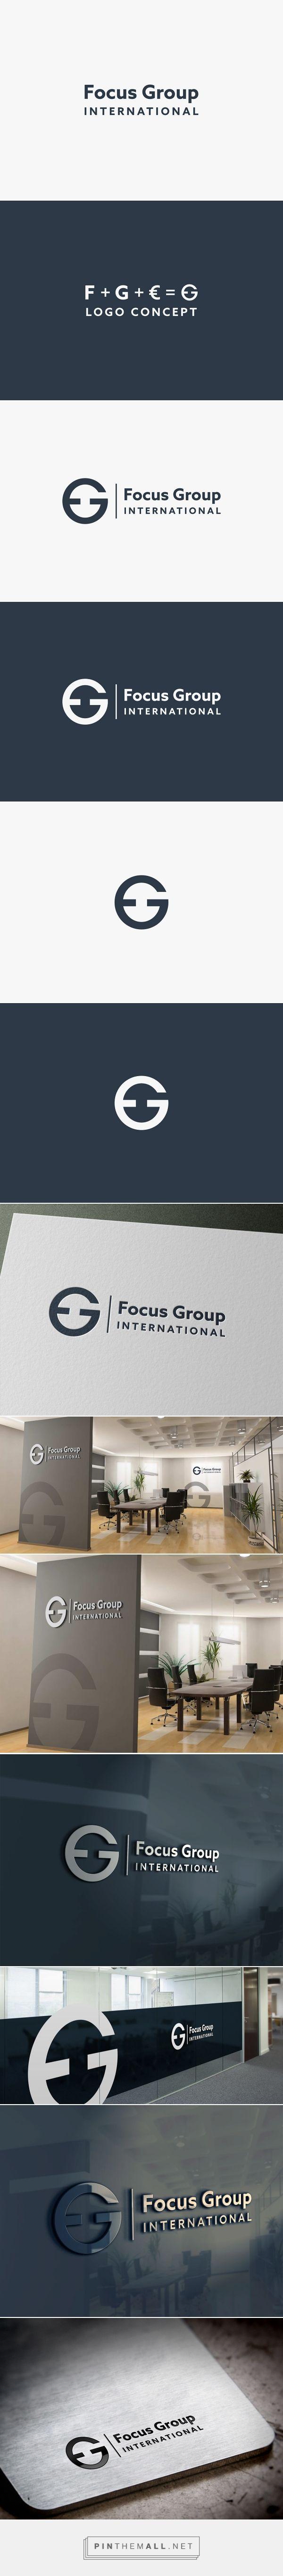 Focus Group // Financial Services on Behance - created via https://pinthemall.net #FinanceLogo